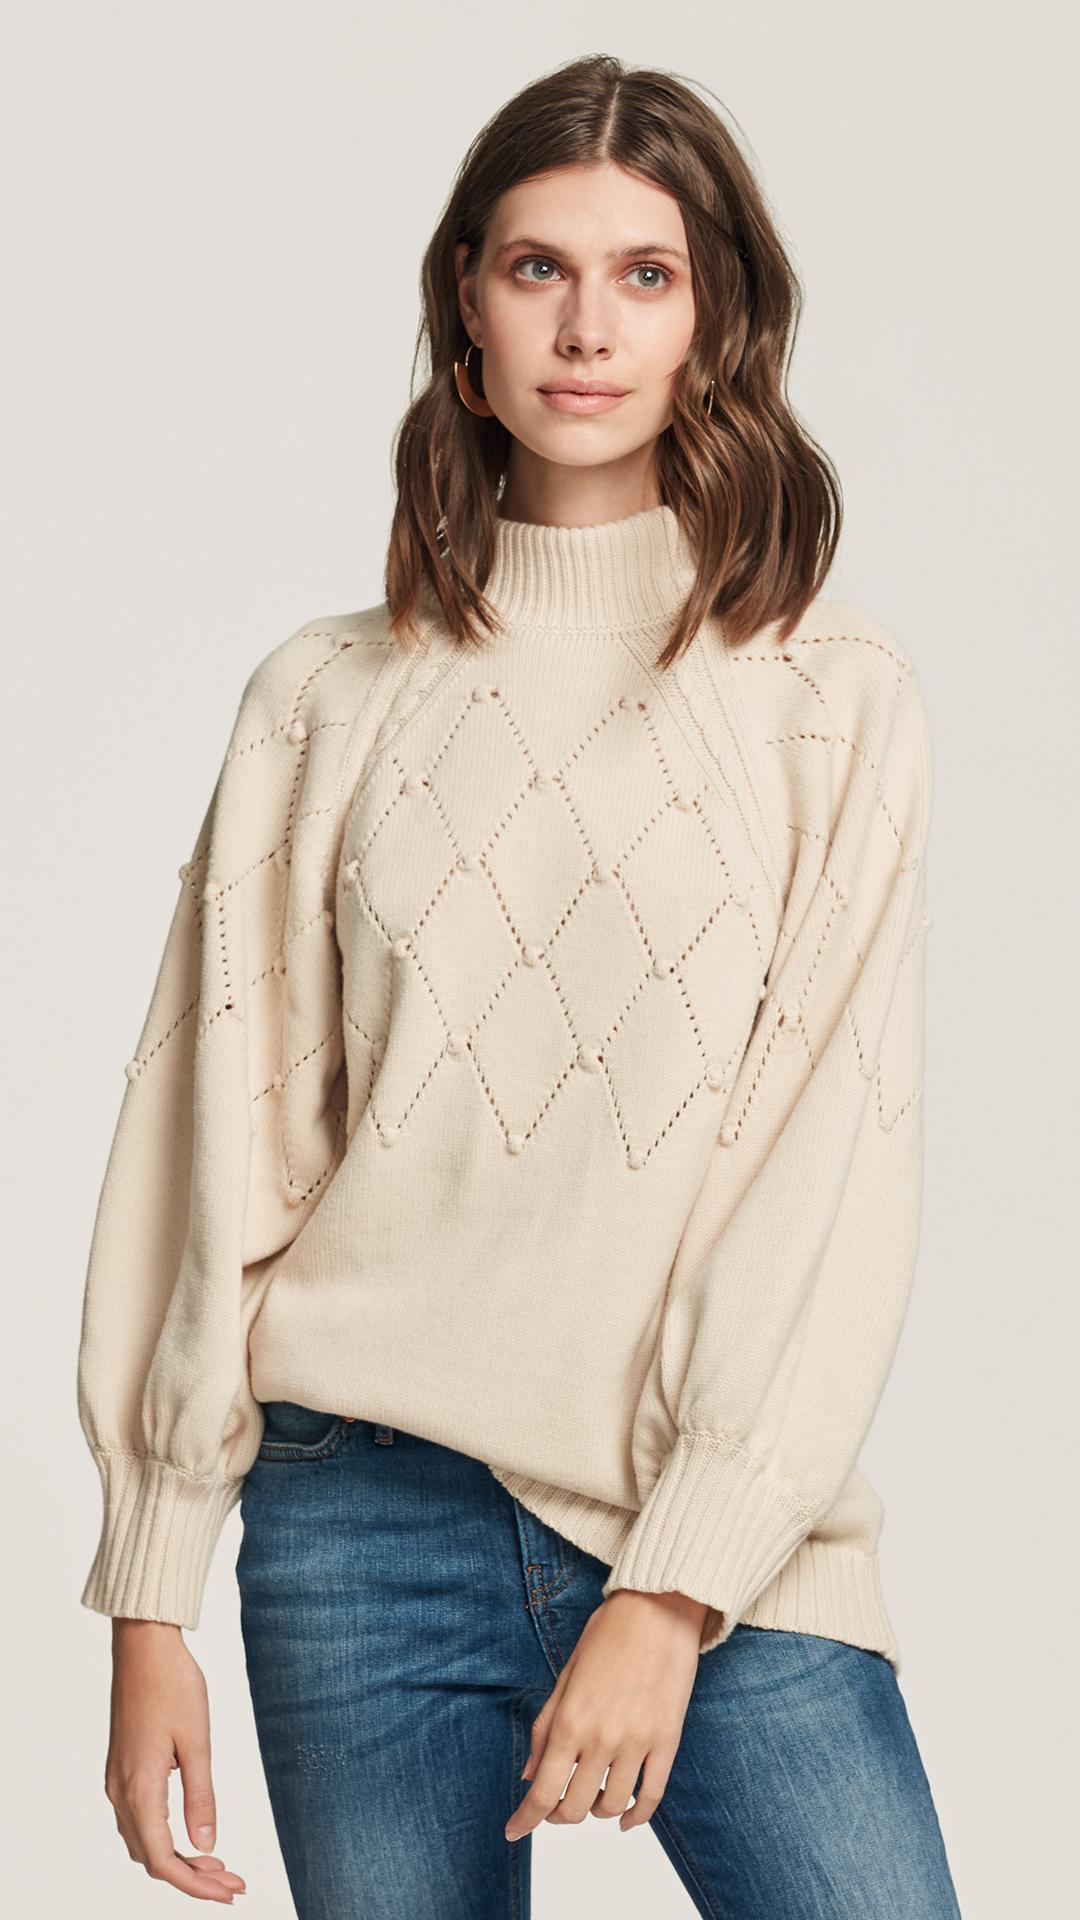 cashmere-jumper_A_1080x1920.jpg